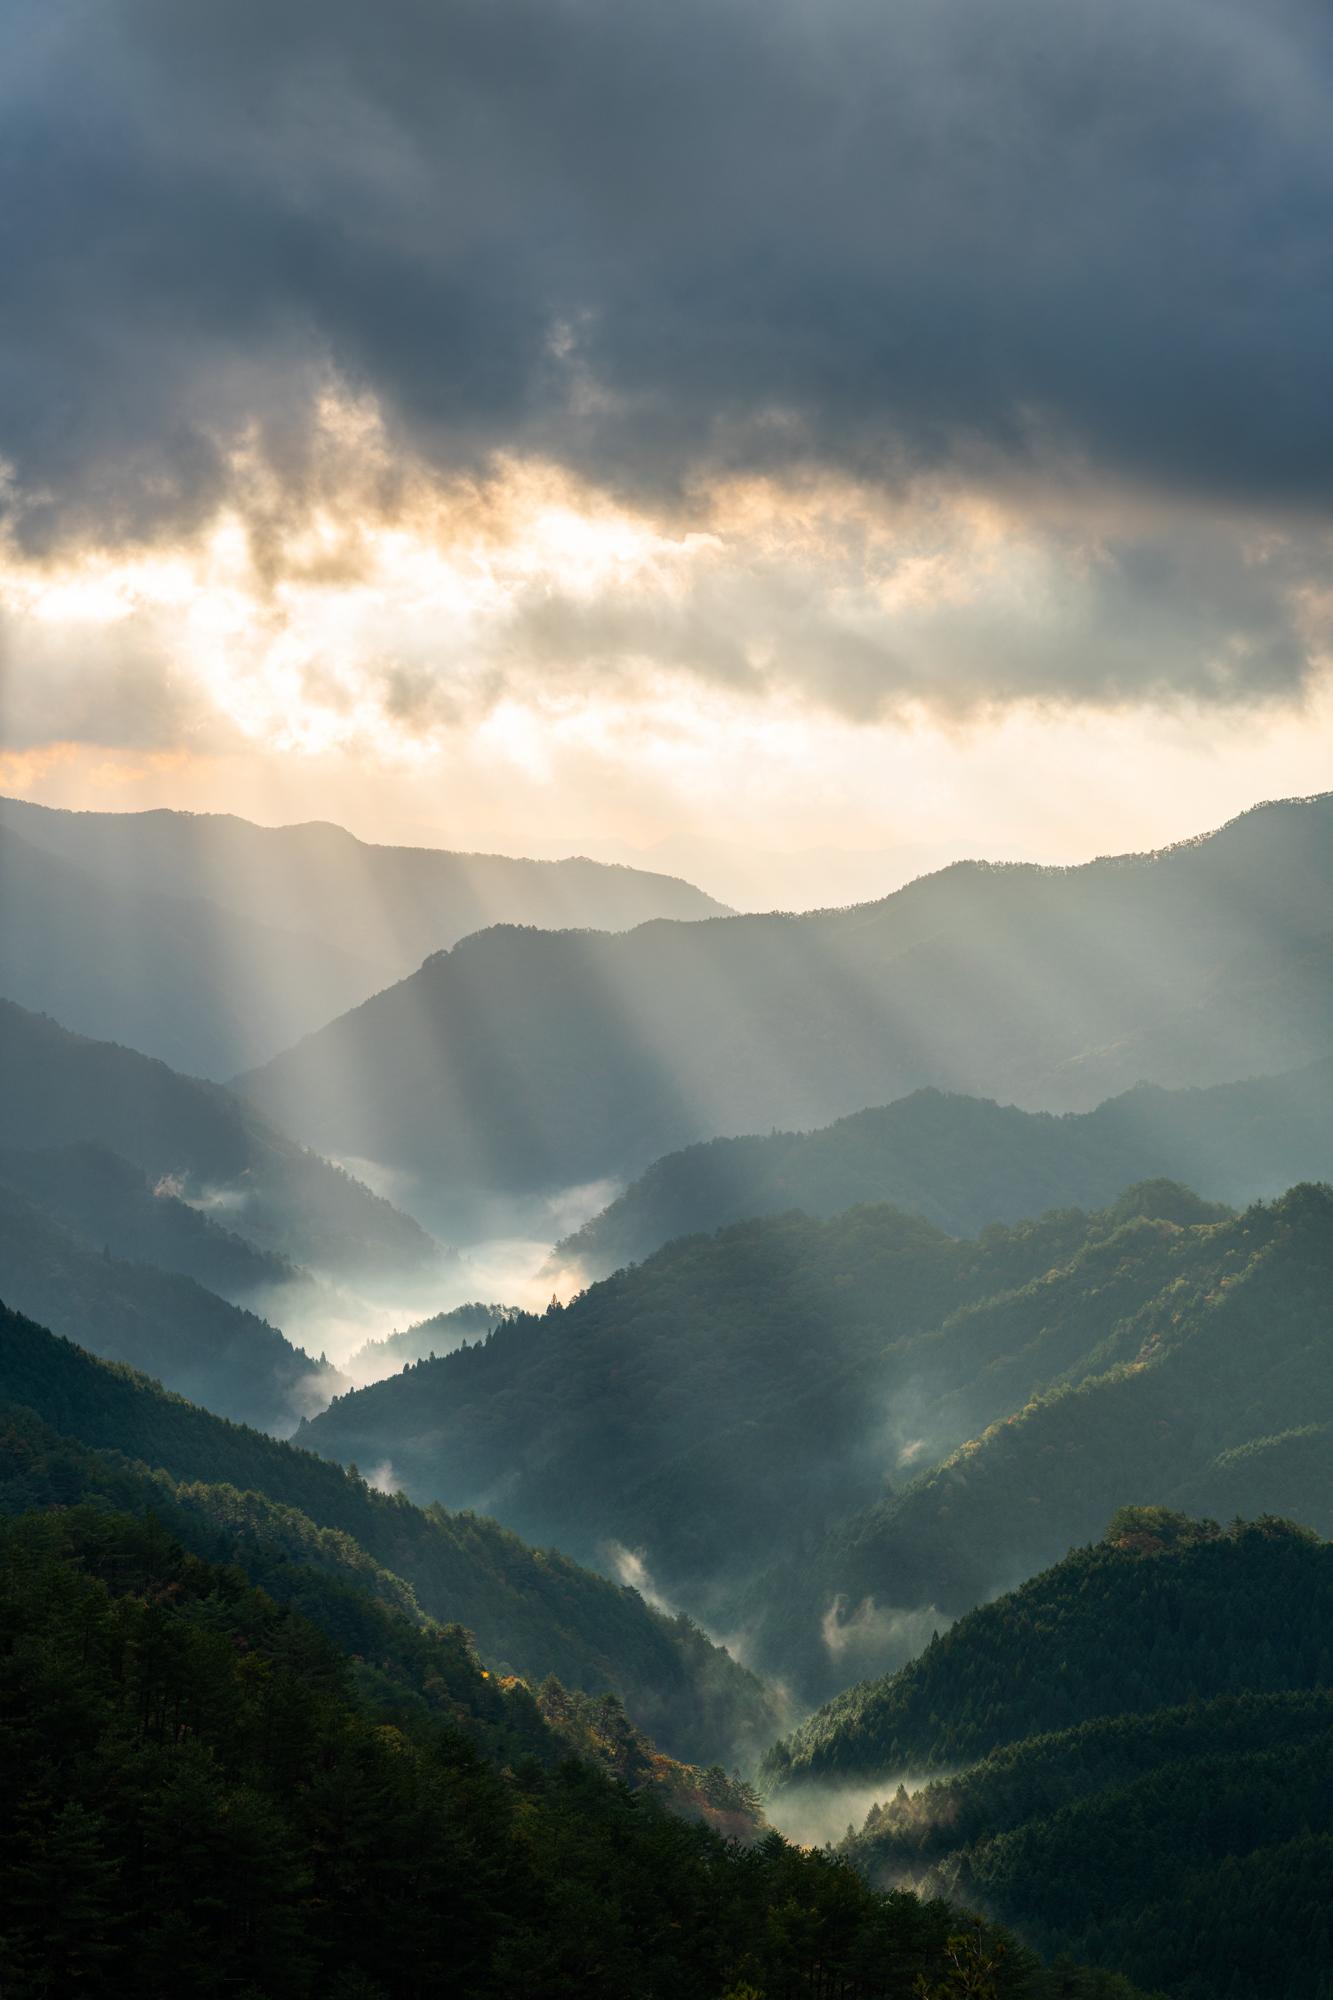 NIKON-CORPORATION_NIKON-D850_2731694514-2731792891_20607 奈良県  野迫川村雲海スポット(雲海や朝日の光芒が見れる秋におすすめの絶景スポット! 撮影した写真の紹介、アクセス情報など)